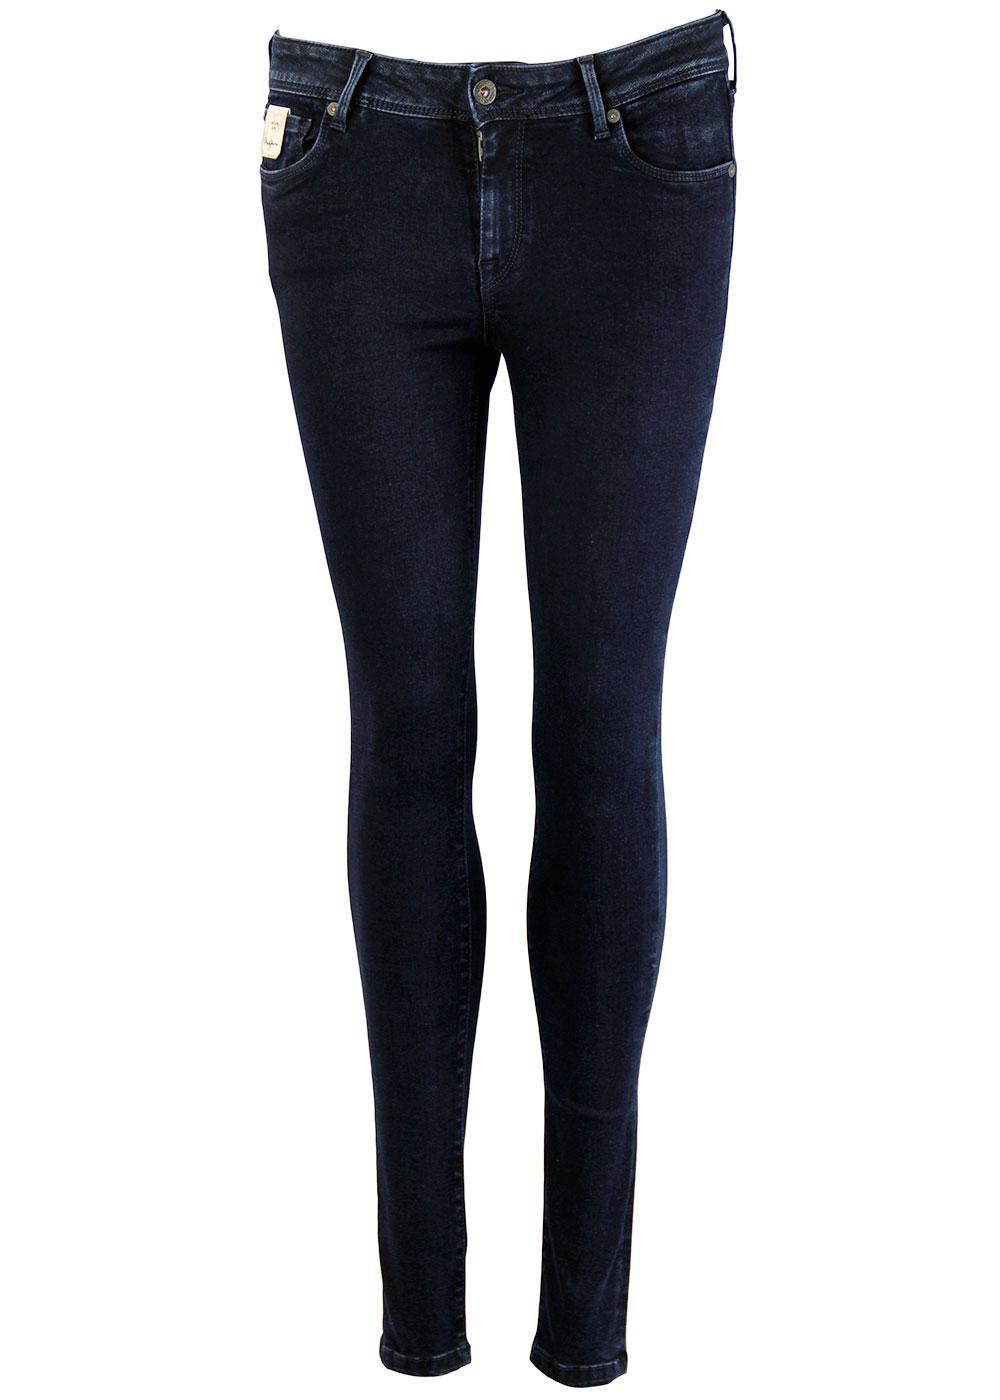 Lola PEPE JEANS Retro Dark Wash Skinny Jeans